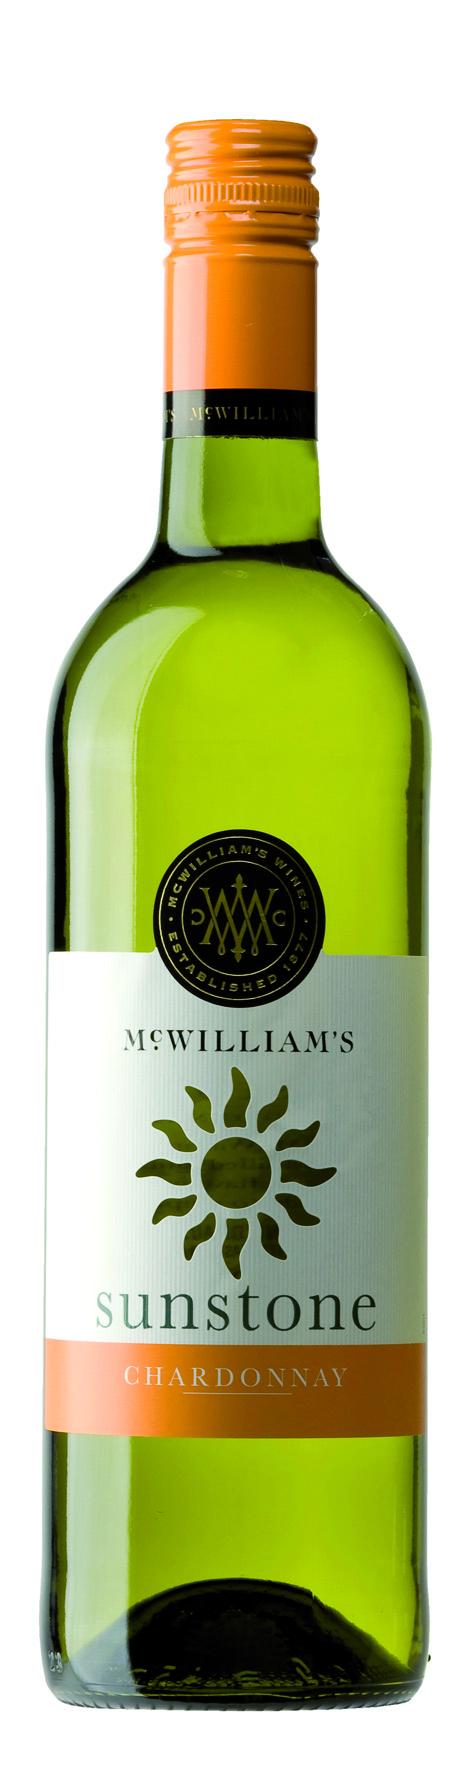 Mc Williams Sunstone, Chardonnay